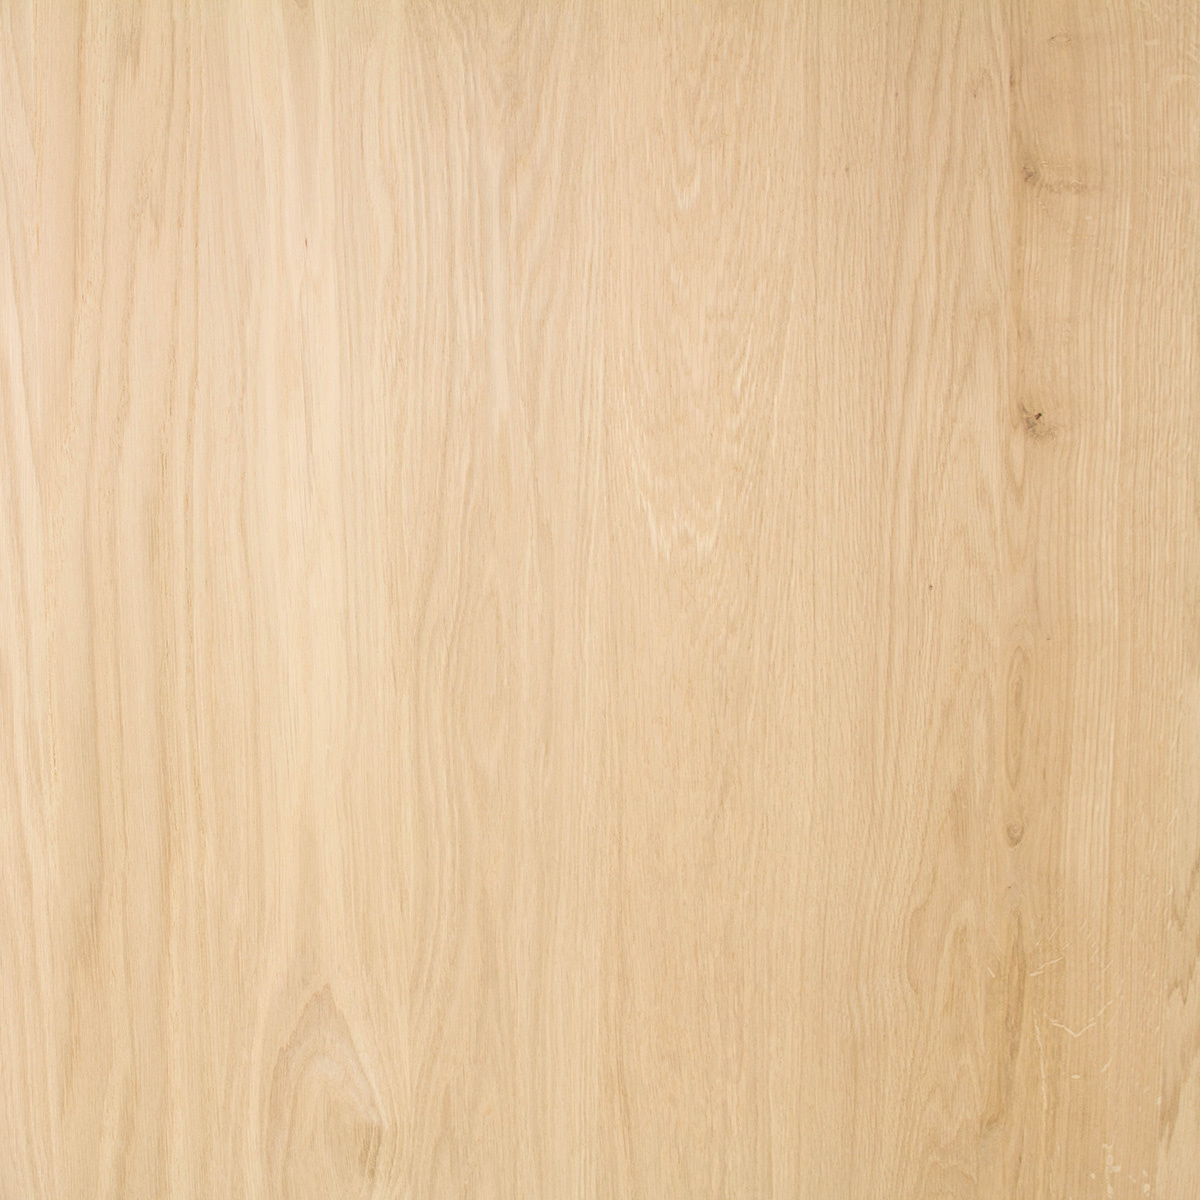 Eiken paneel foutvrij 2 cm - 122 cm breed - vaste lengtestaffels - Meubelblad 8-12% kd Europees eikenhout